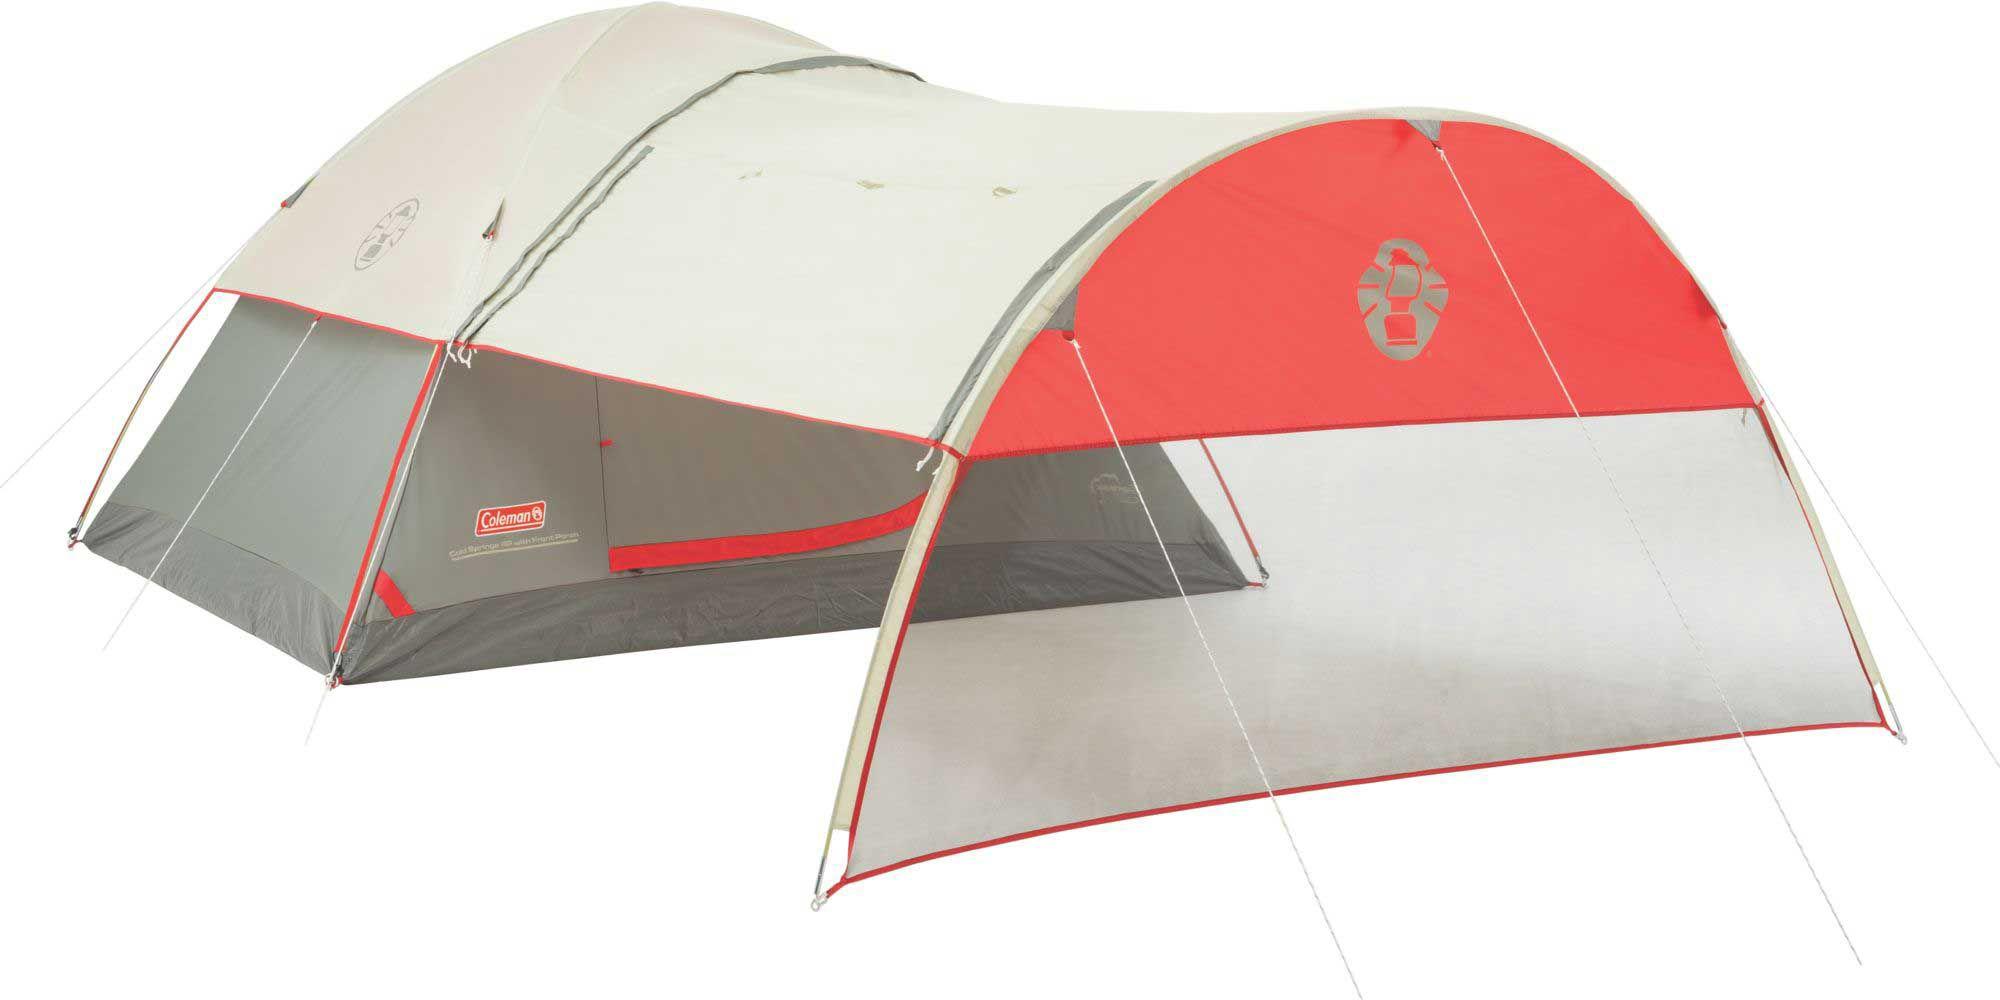 Coleman 4-Person Sundome Tent  sc 1 st  Field u0026 Stream & Coleman 4-Person Sundome Tent | Field u0026 Stream